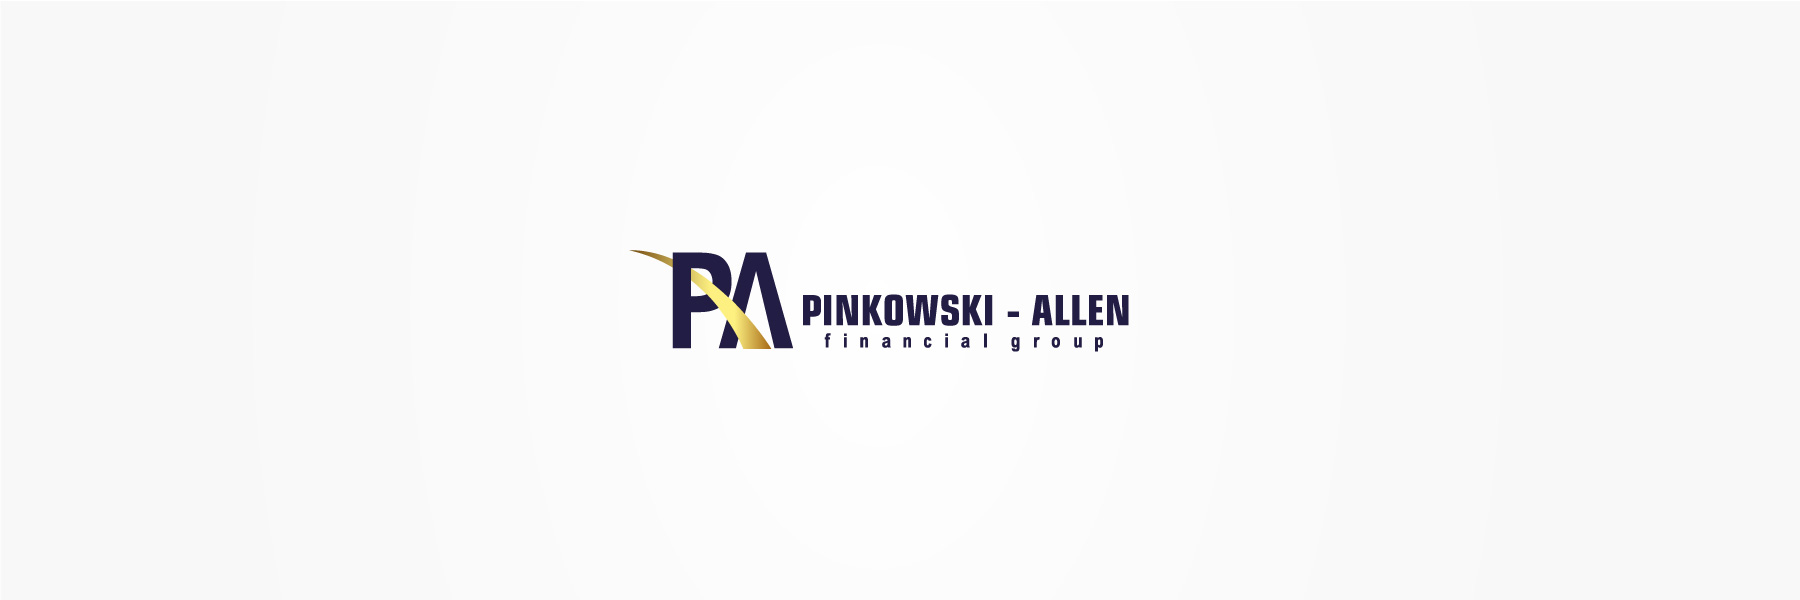 Pinkowski-Allen-Logo-Design